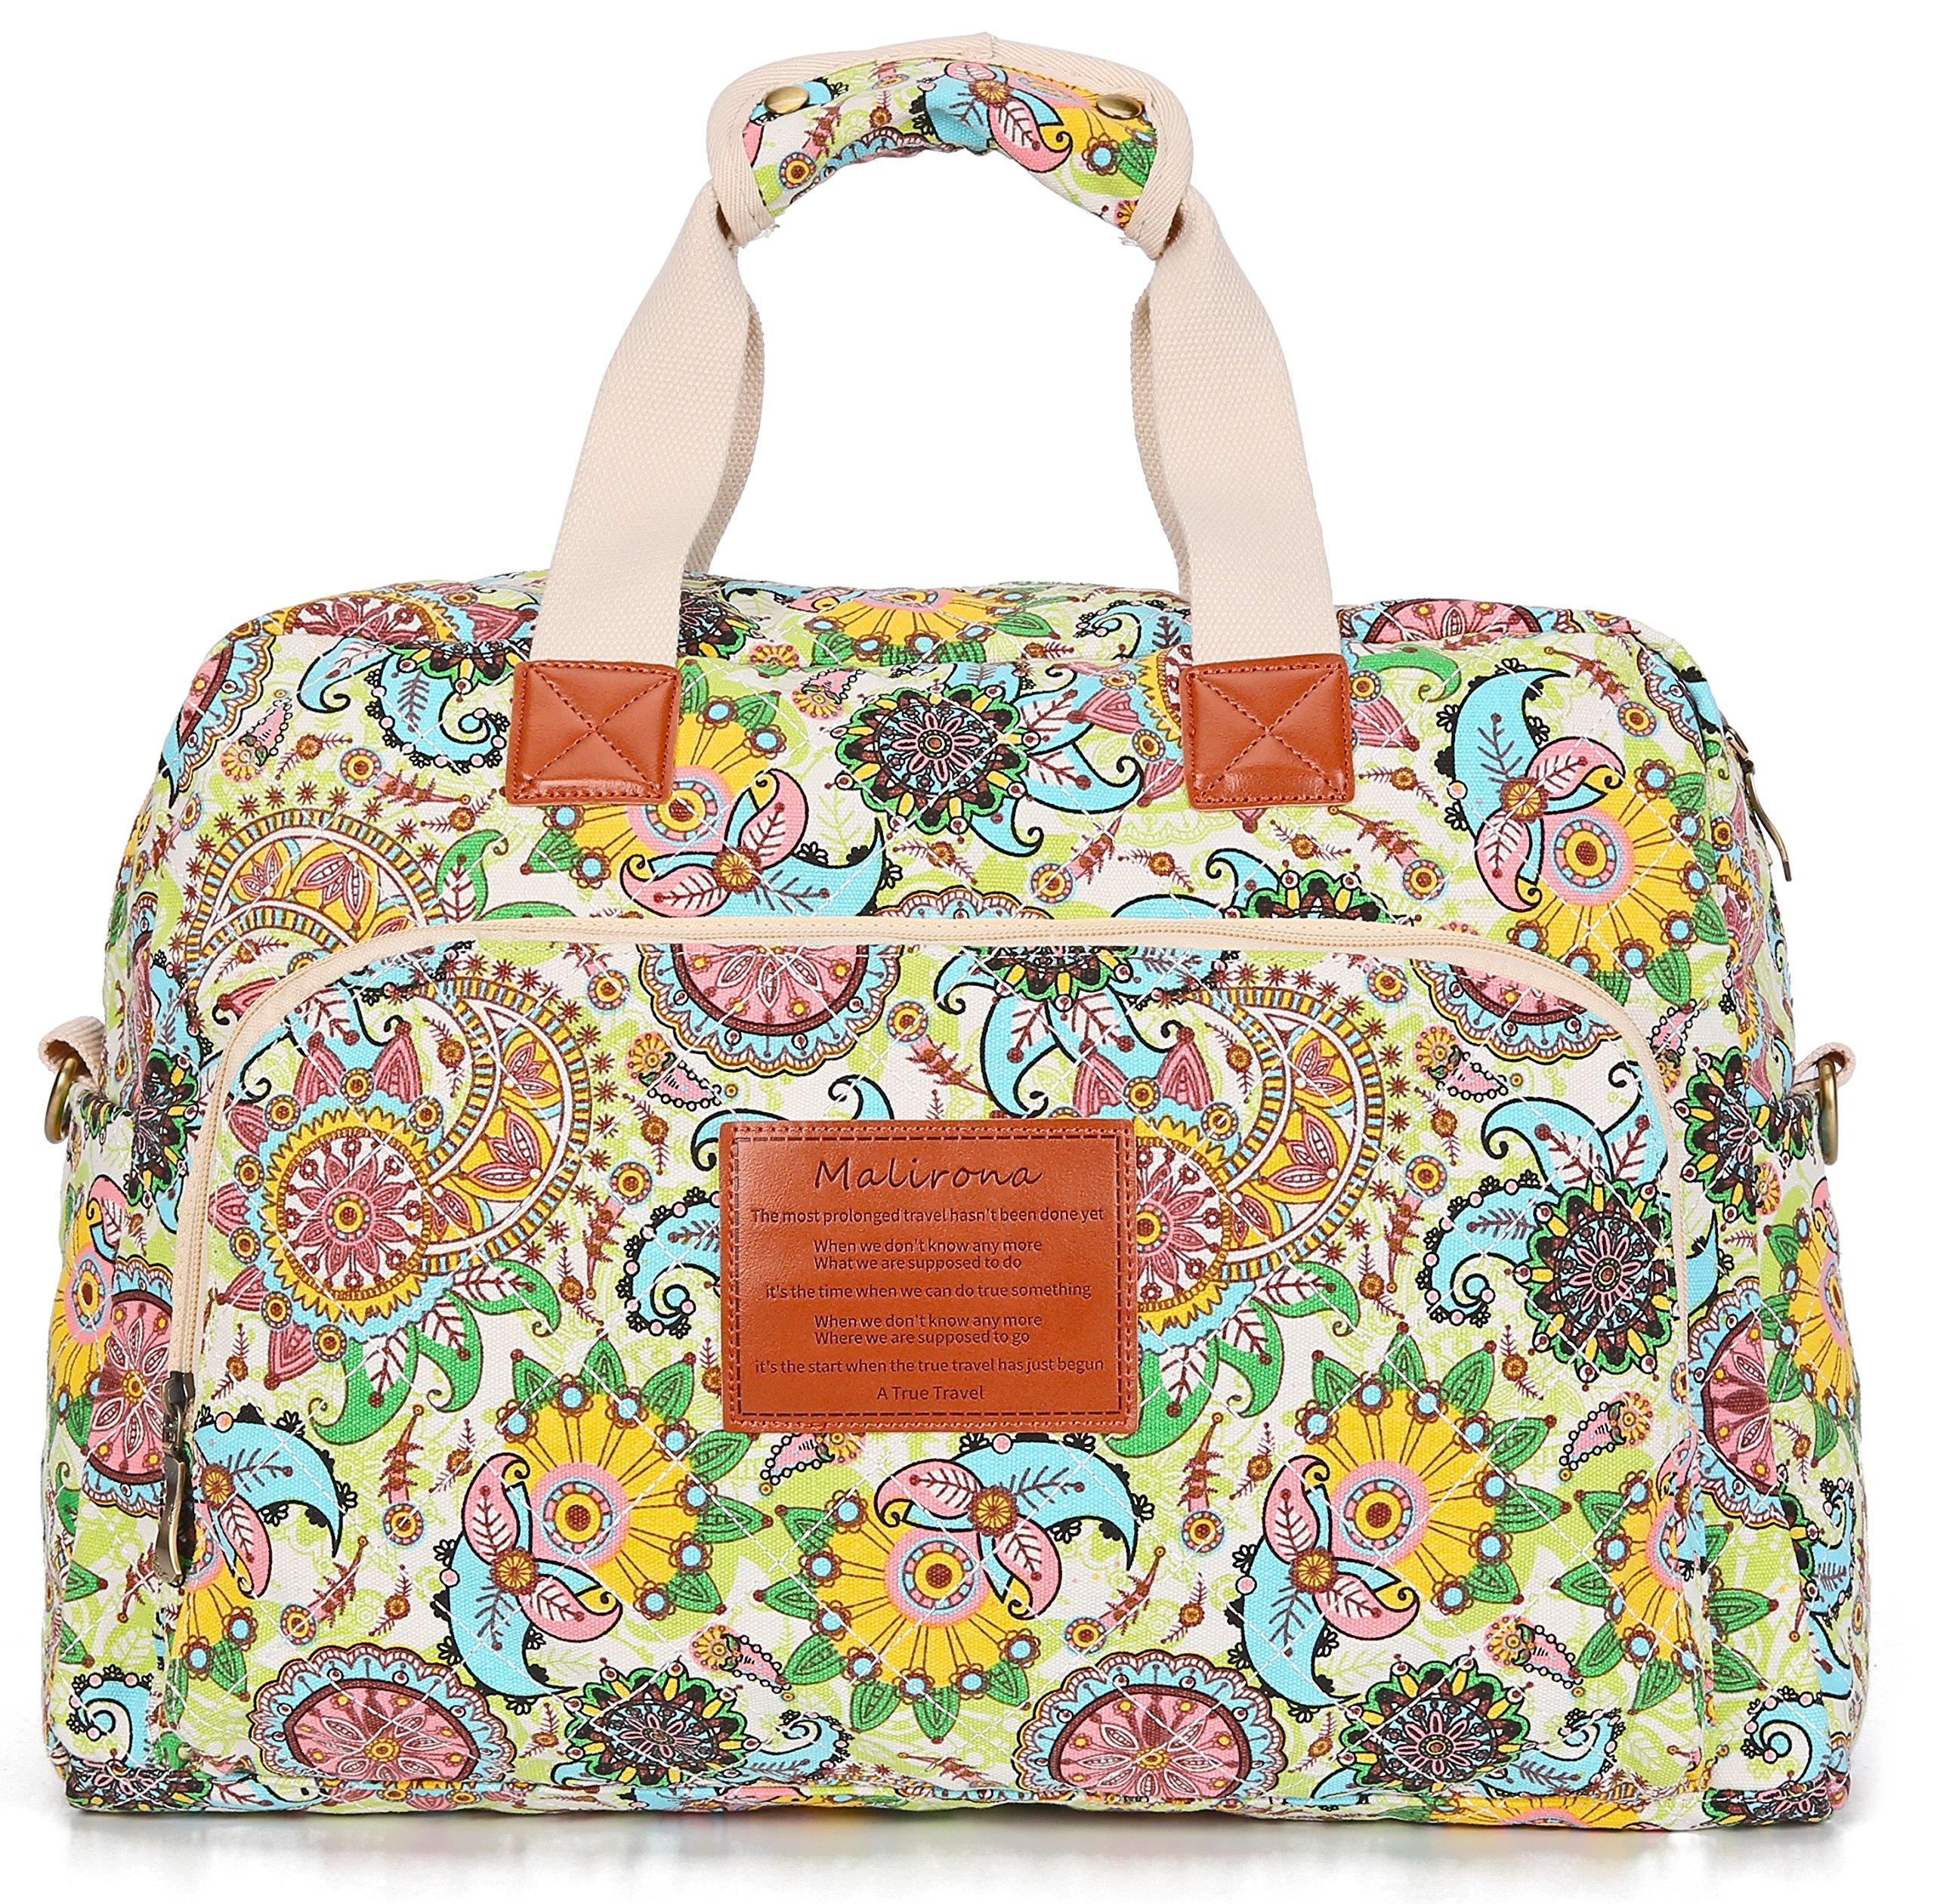 Malirona Canvas Overnight Bag Women Weekender Bag Carry On Travel Duffel Bag Floral Design (Flower) by Malirona (Image #2)